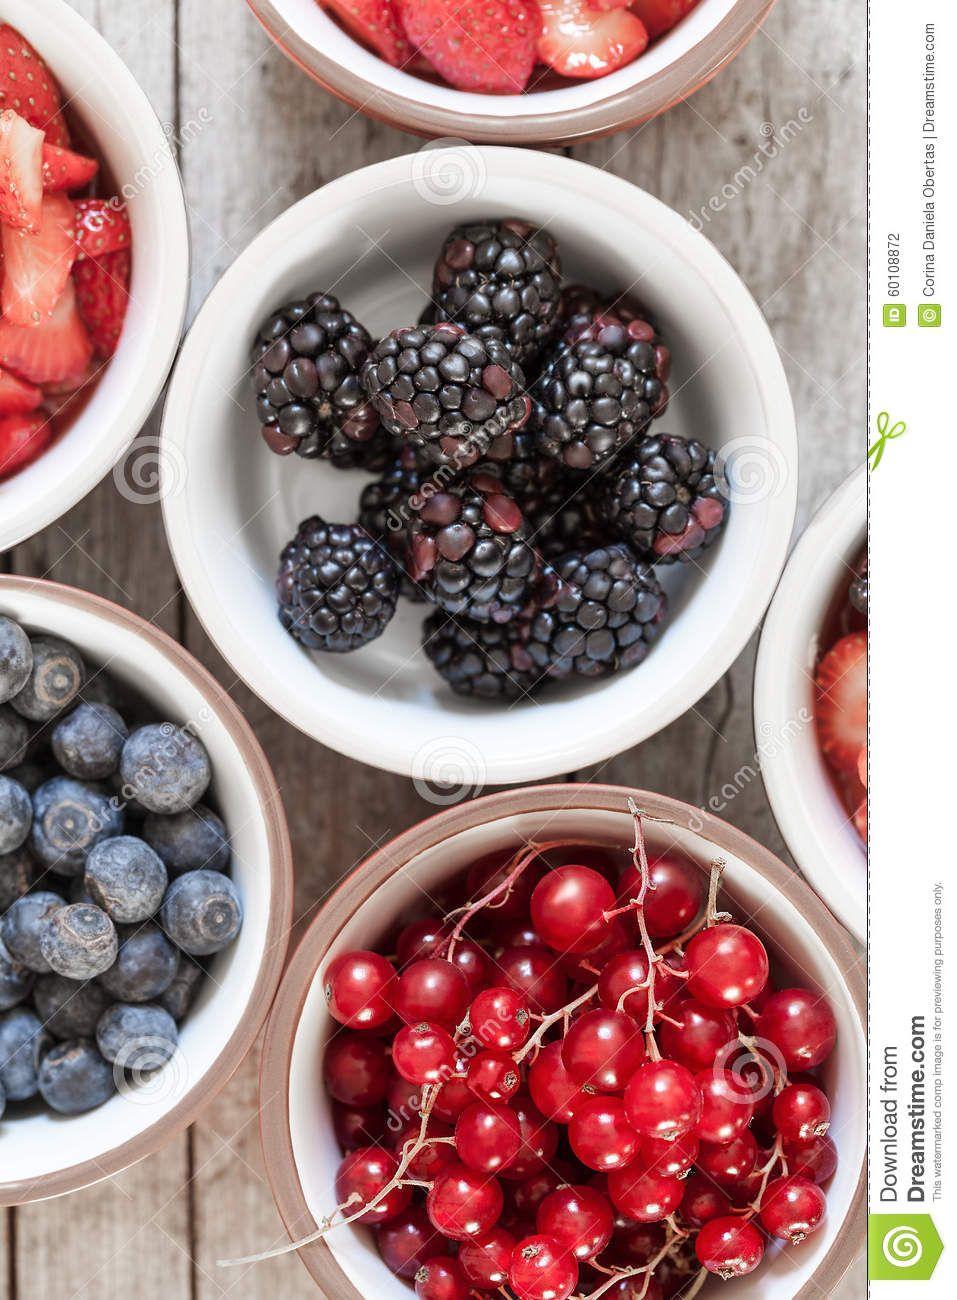 blox fruit stock today